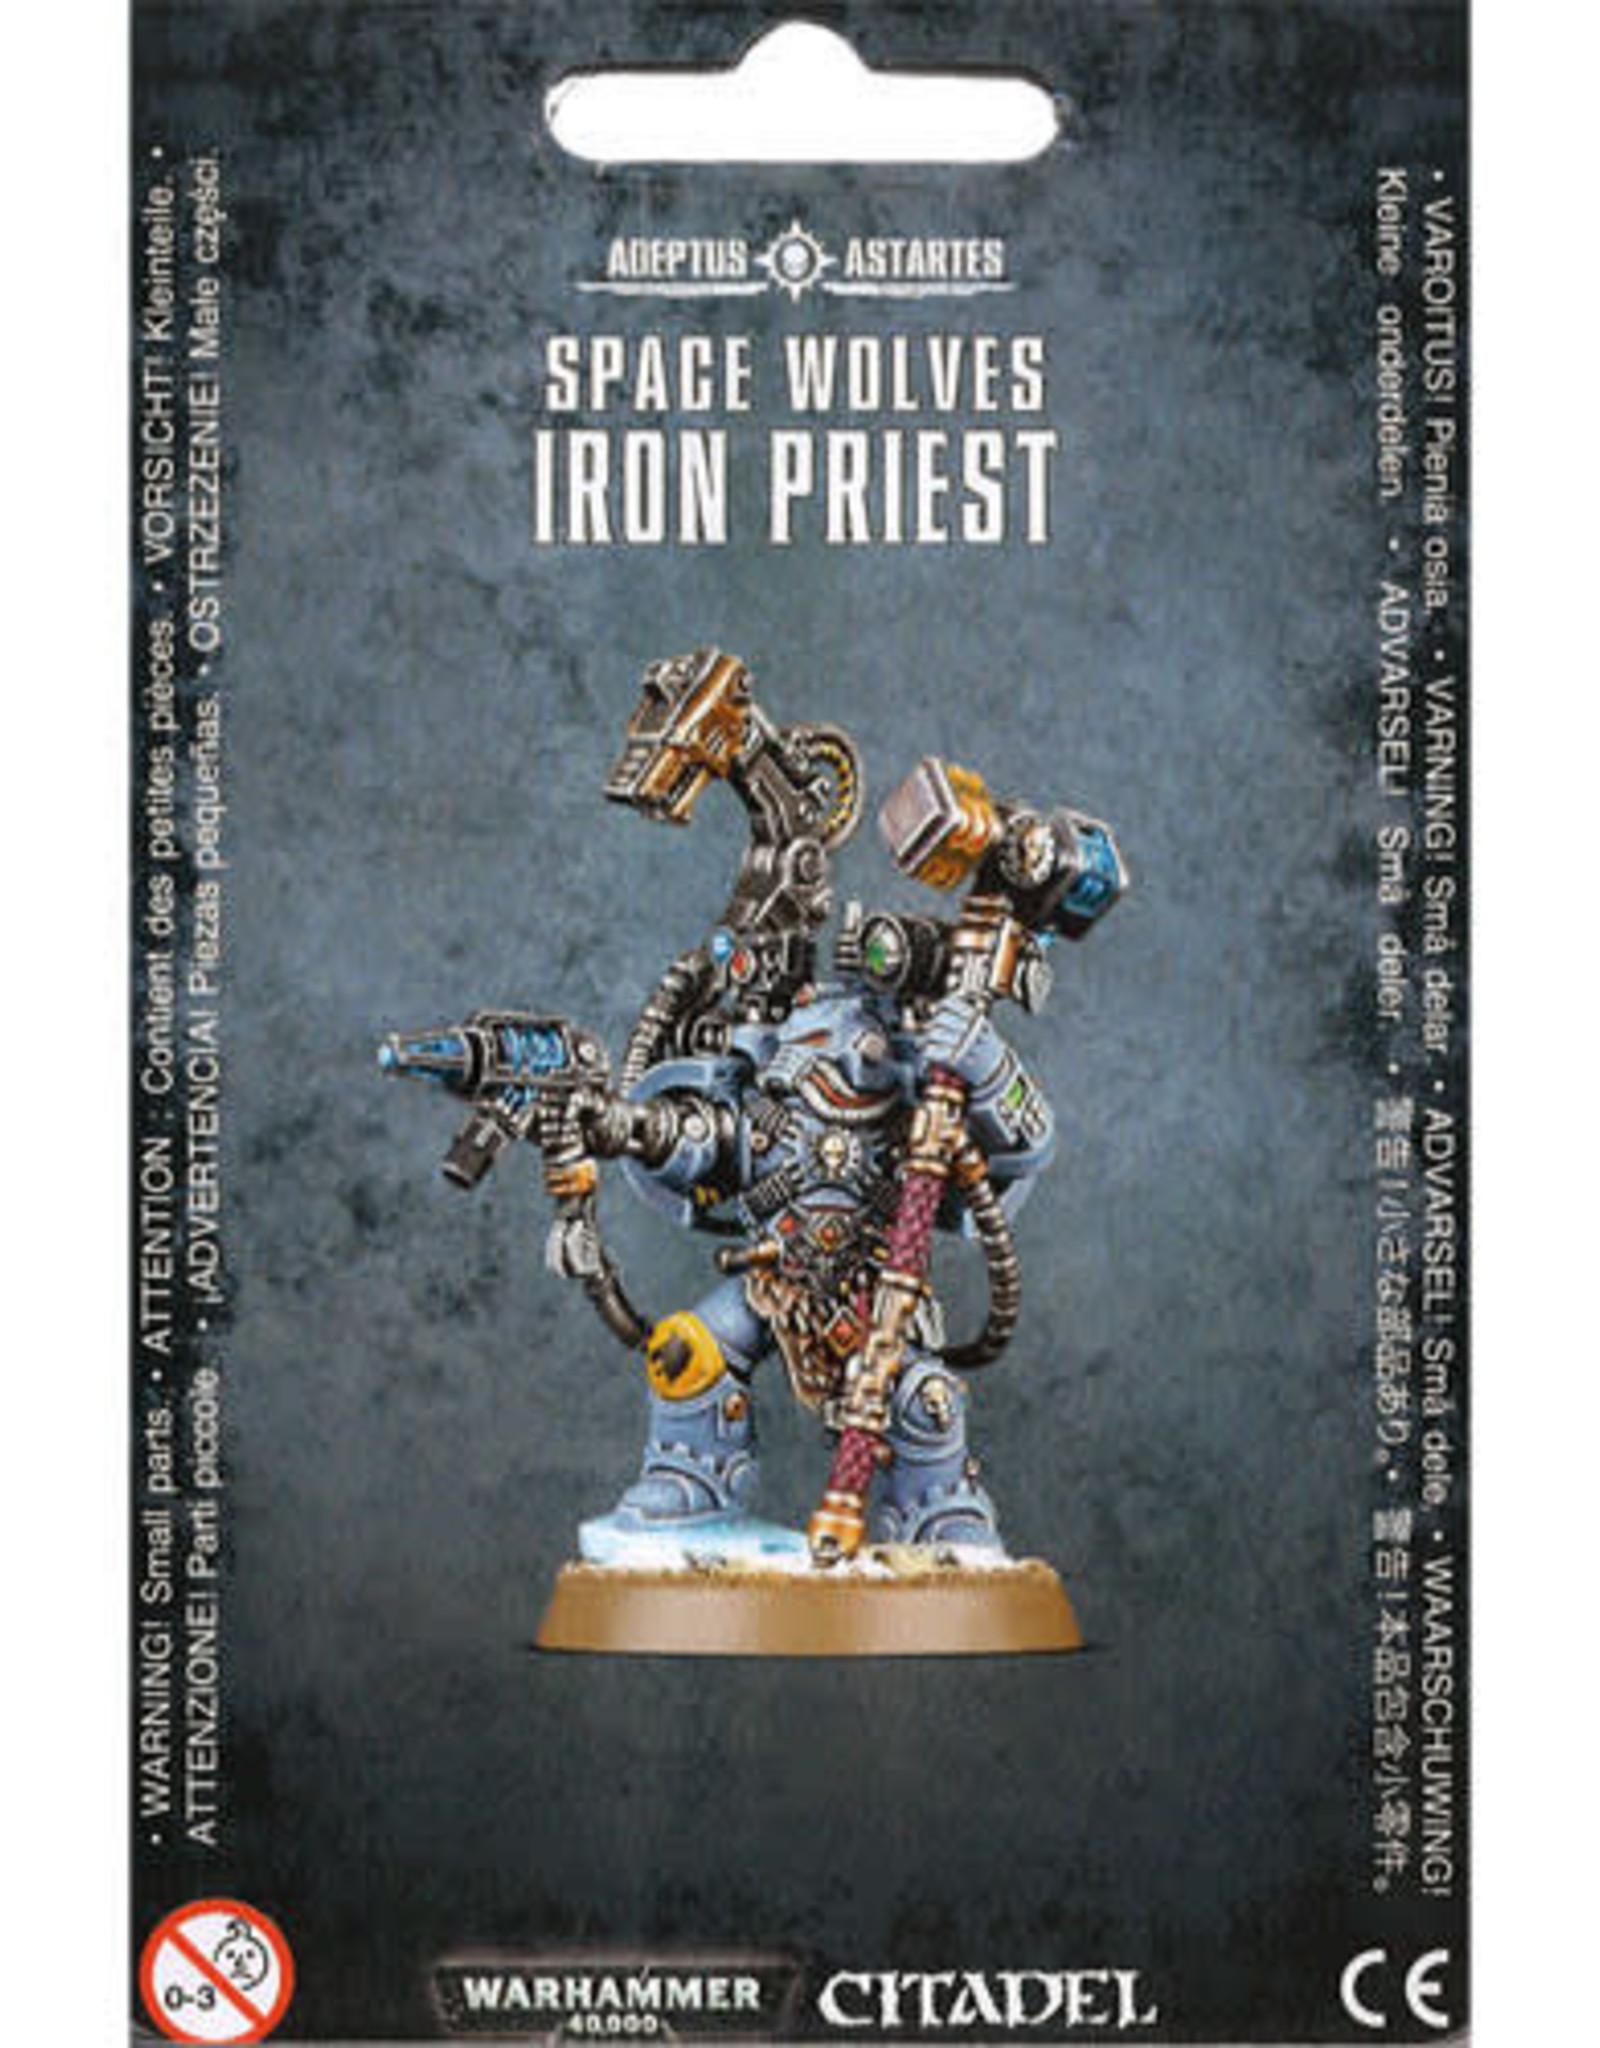 Warhammer 40K Space Wolves Iron Priest